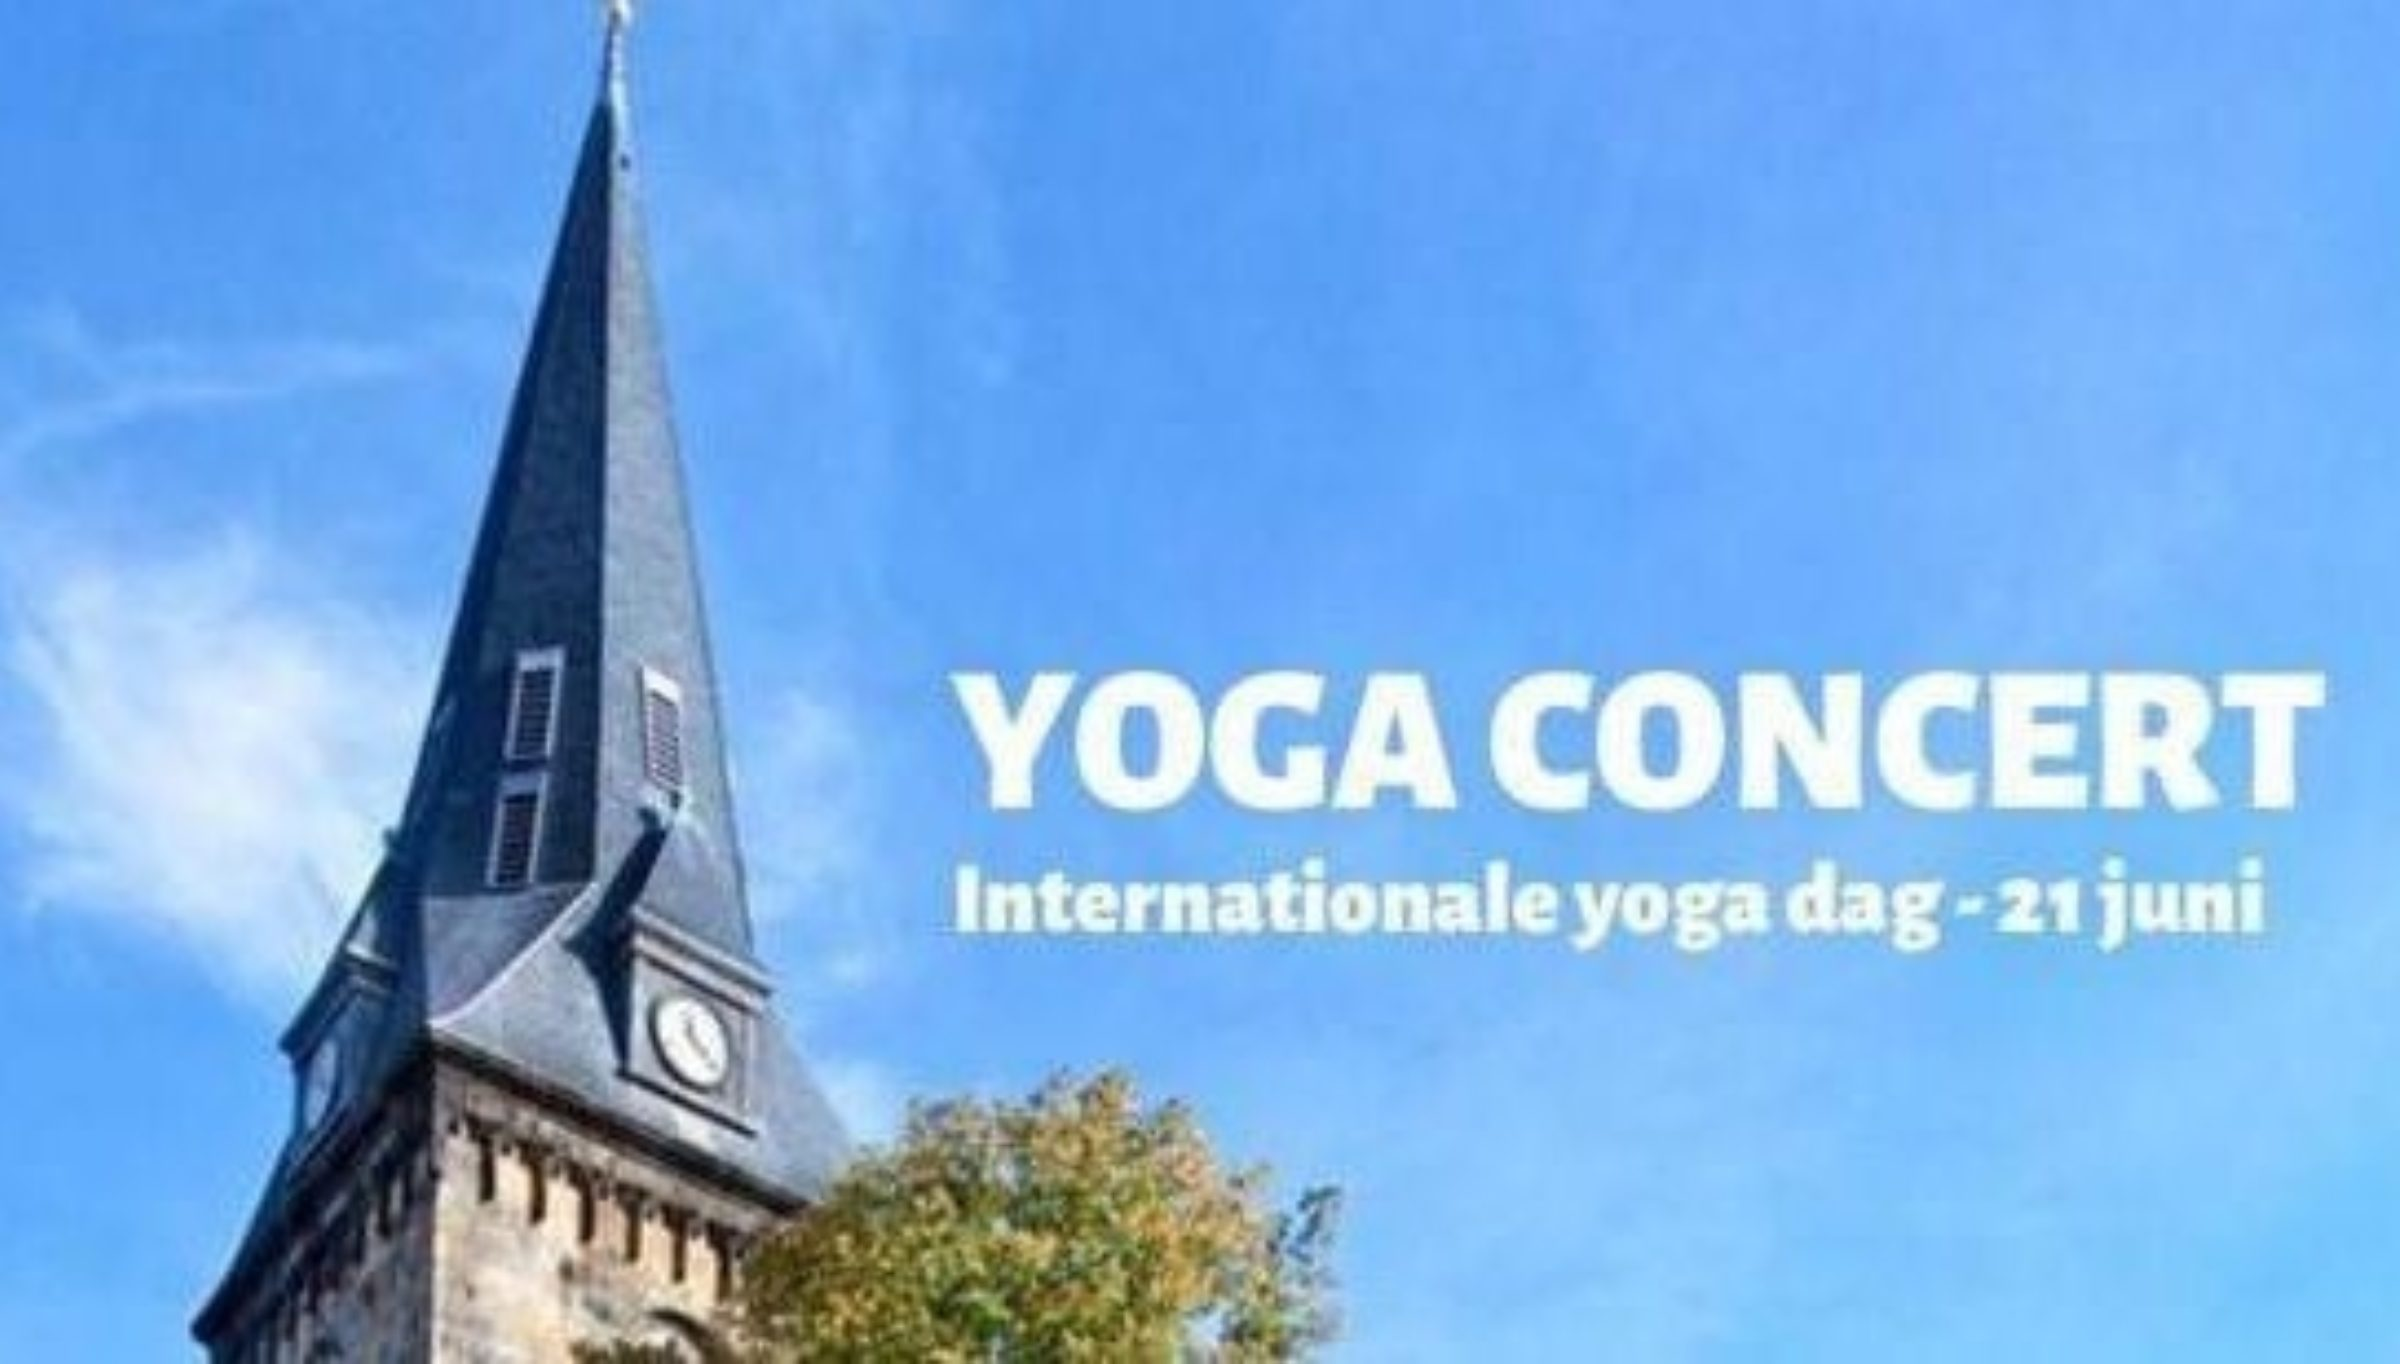 Yoga concert 2540 1553788244 35hxembiyd